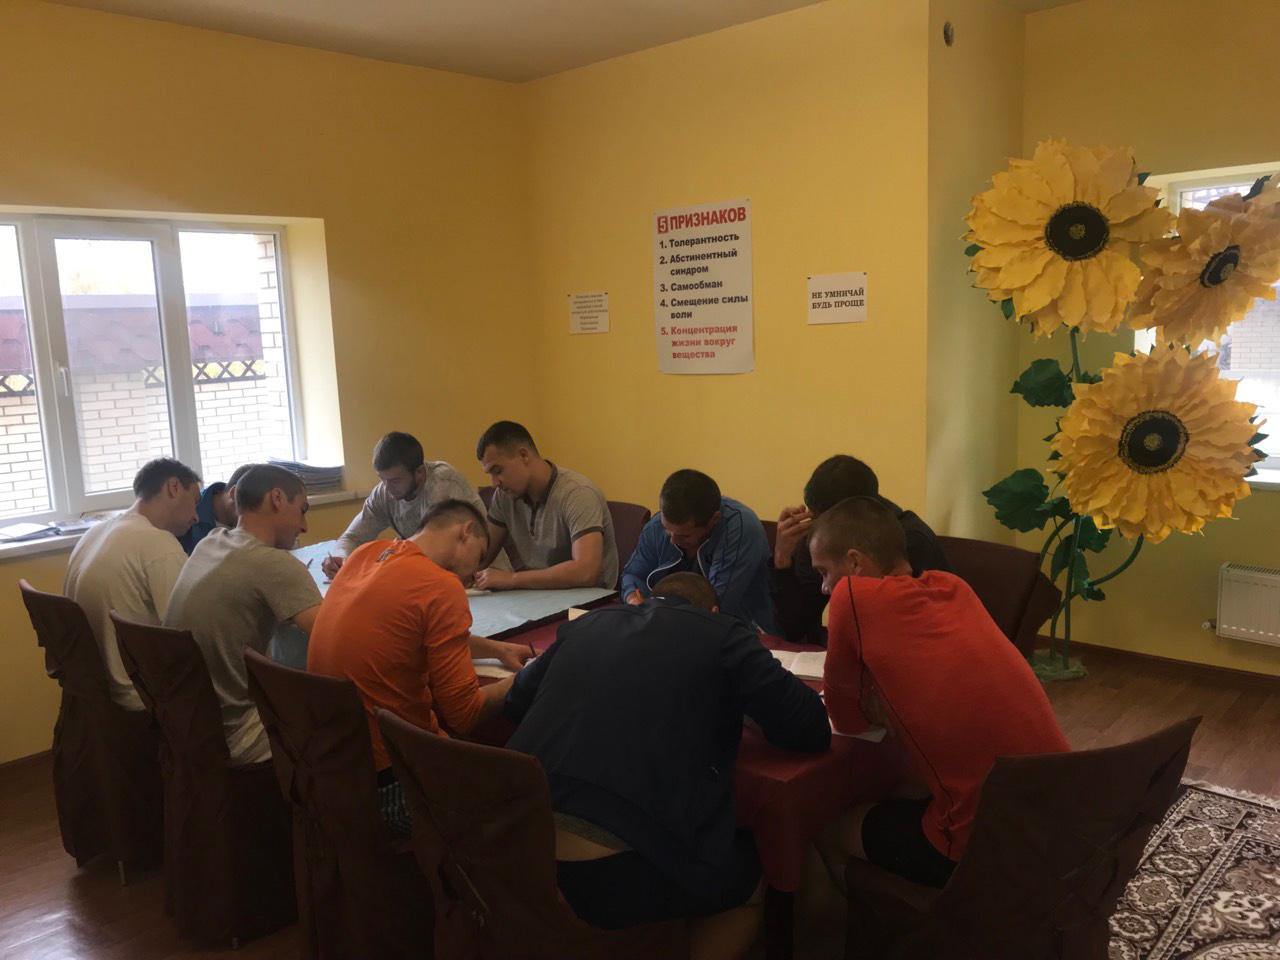 Условия при лечение наркомании Луганск РЦ Виктори Луганск